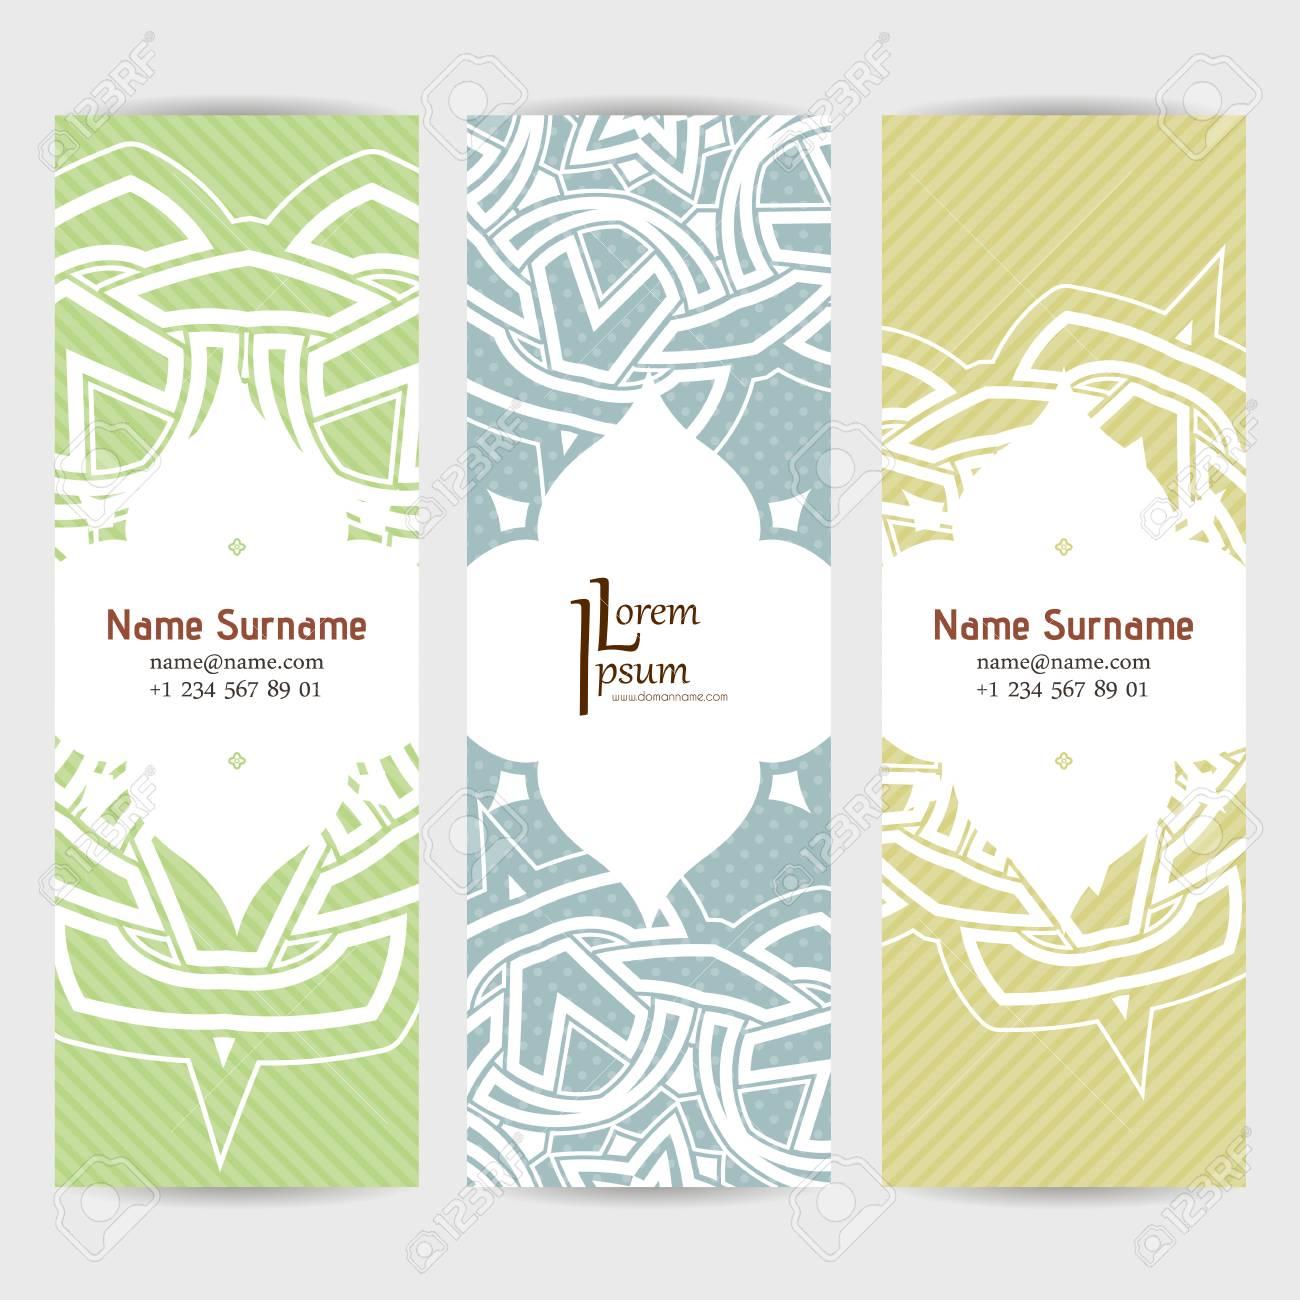 set of vector design templates brochures in random colorful